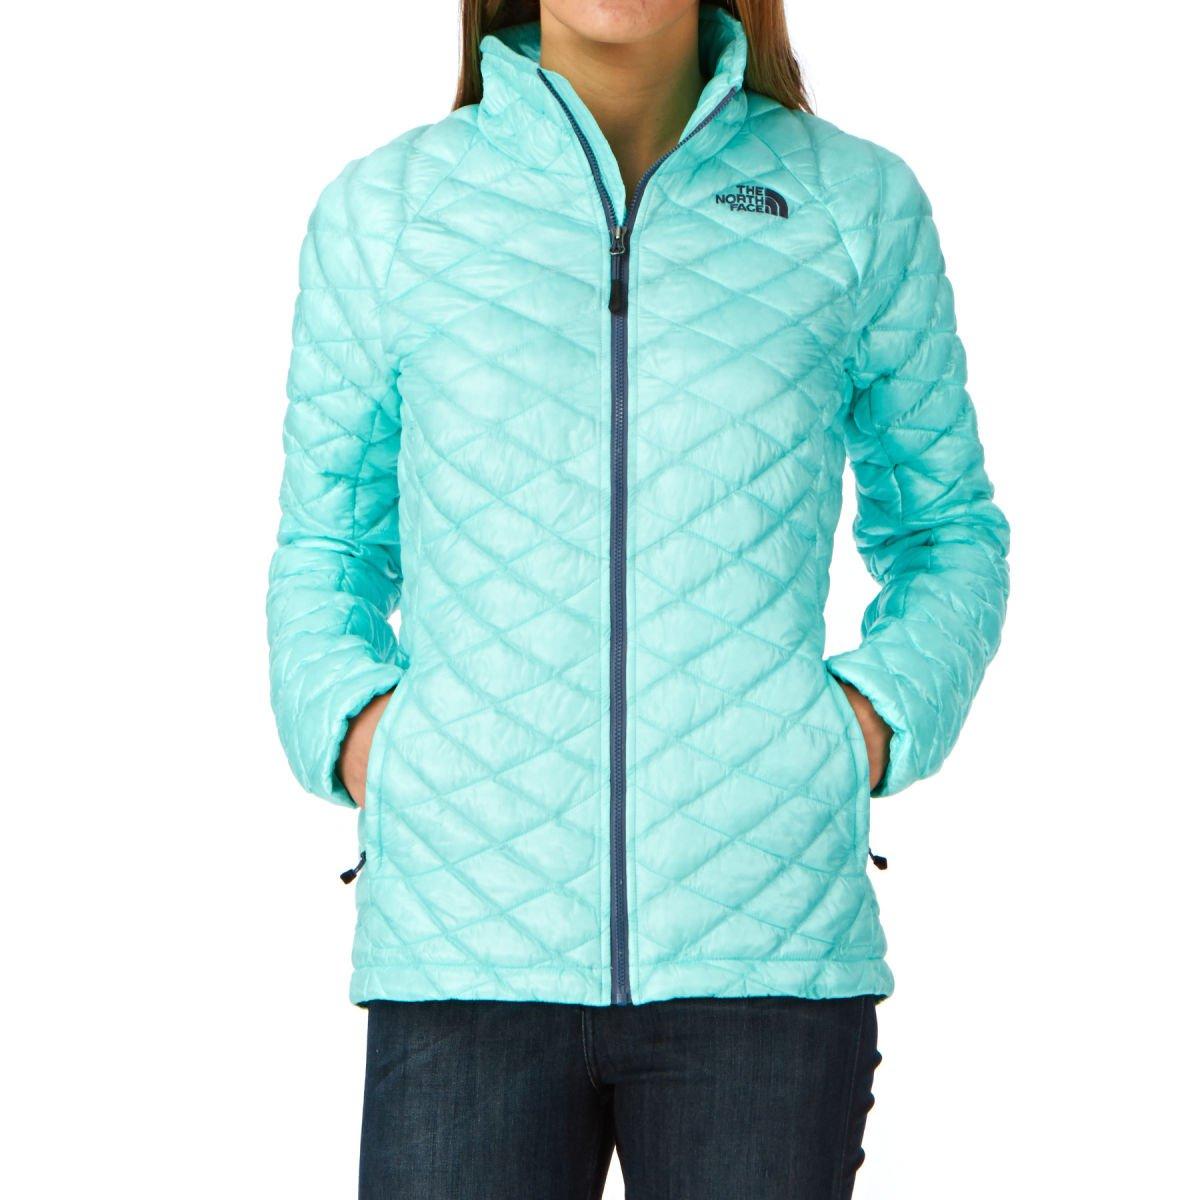 Damen Outdoor-Isolationsjacke/ Steppjacke Thermoball Full Zip Jacket W jetzt bestellen